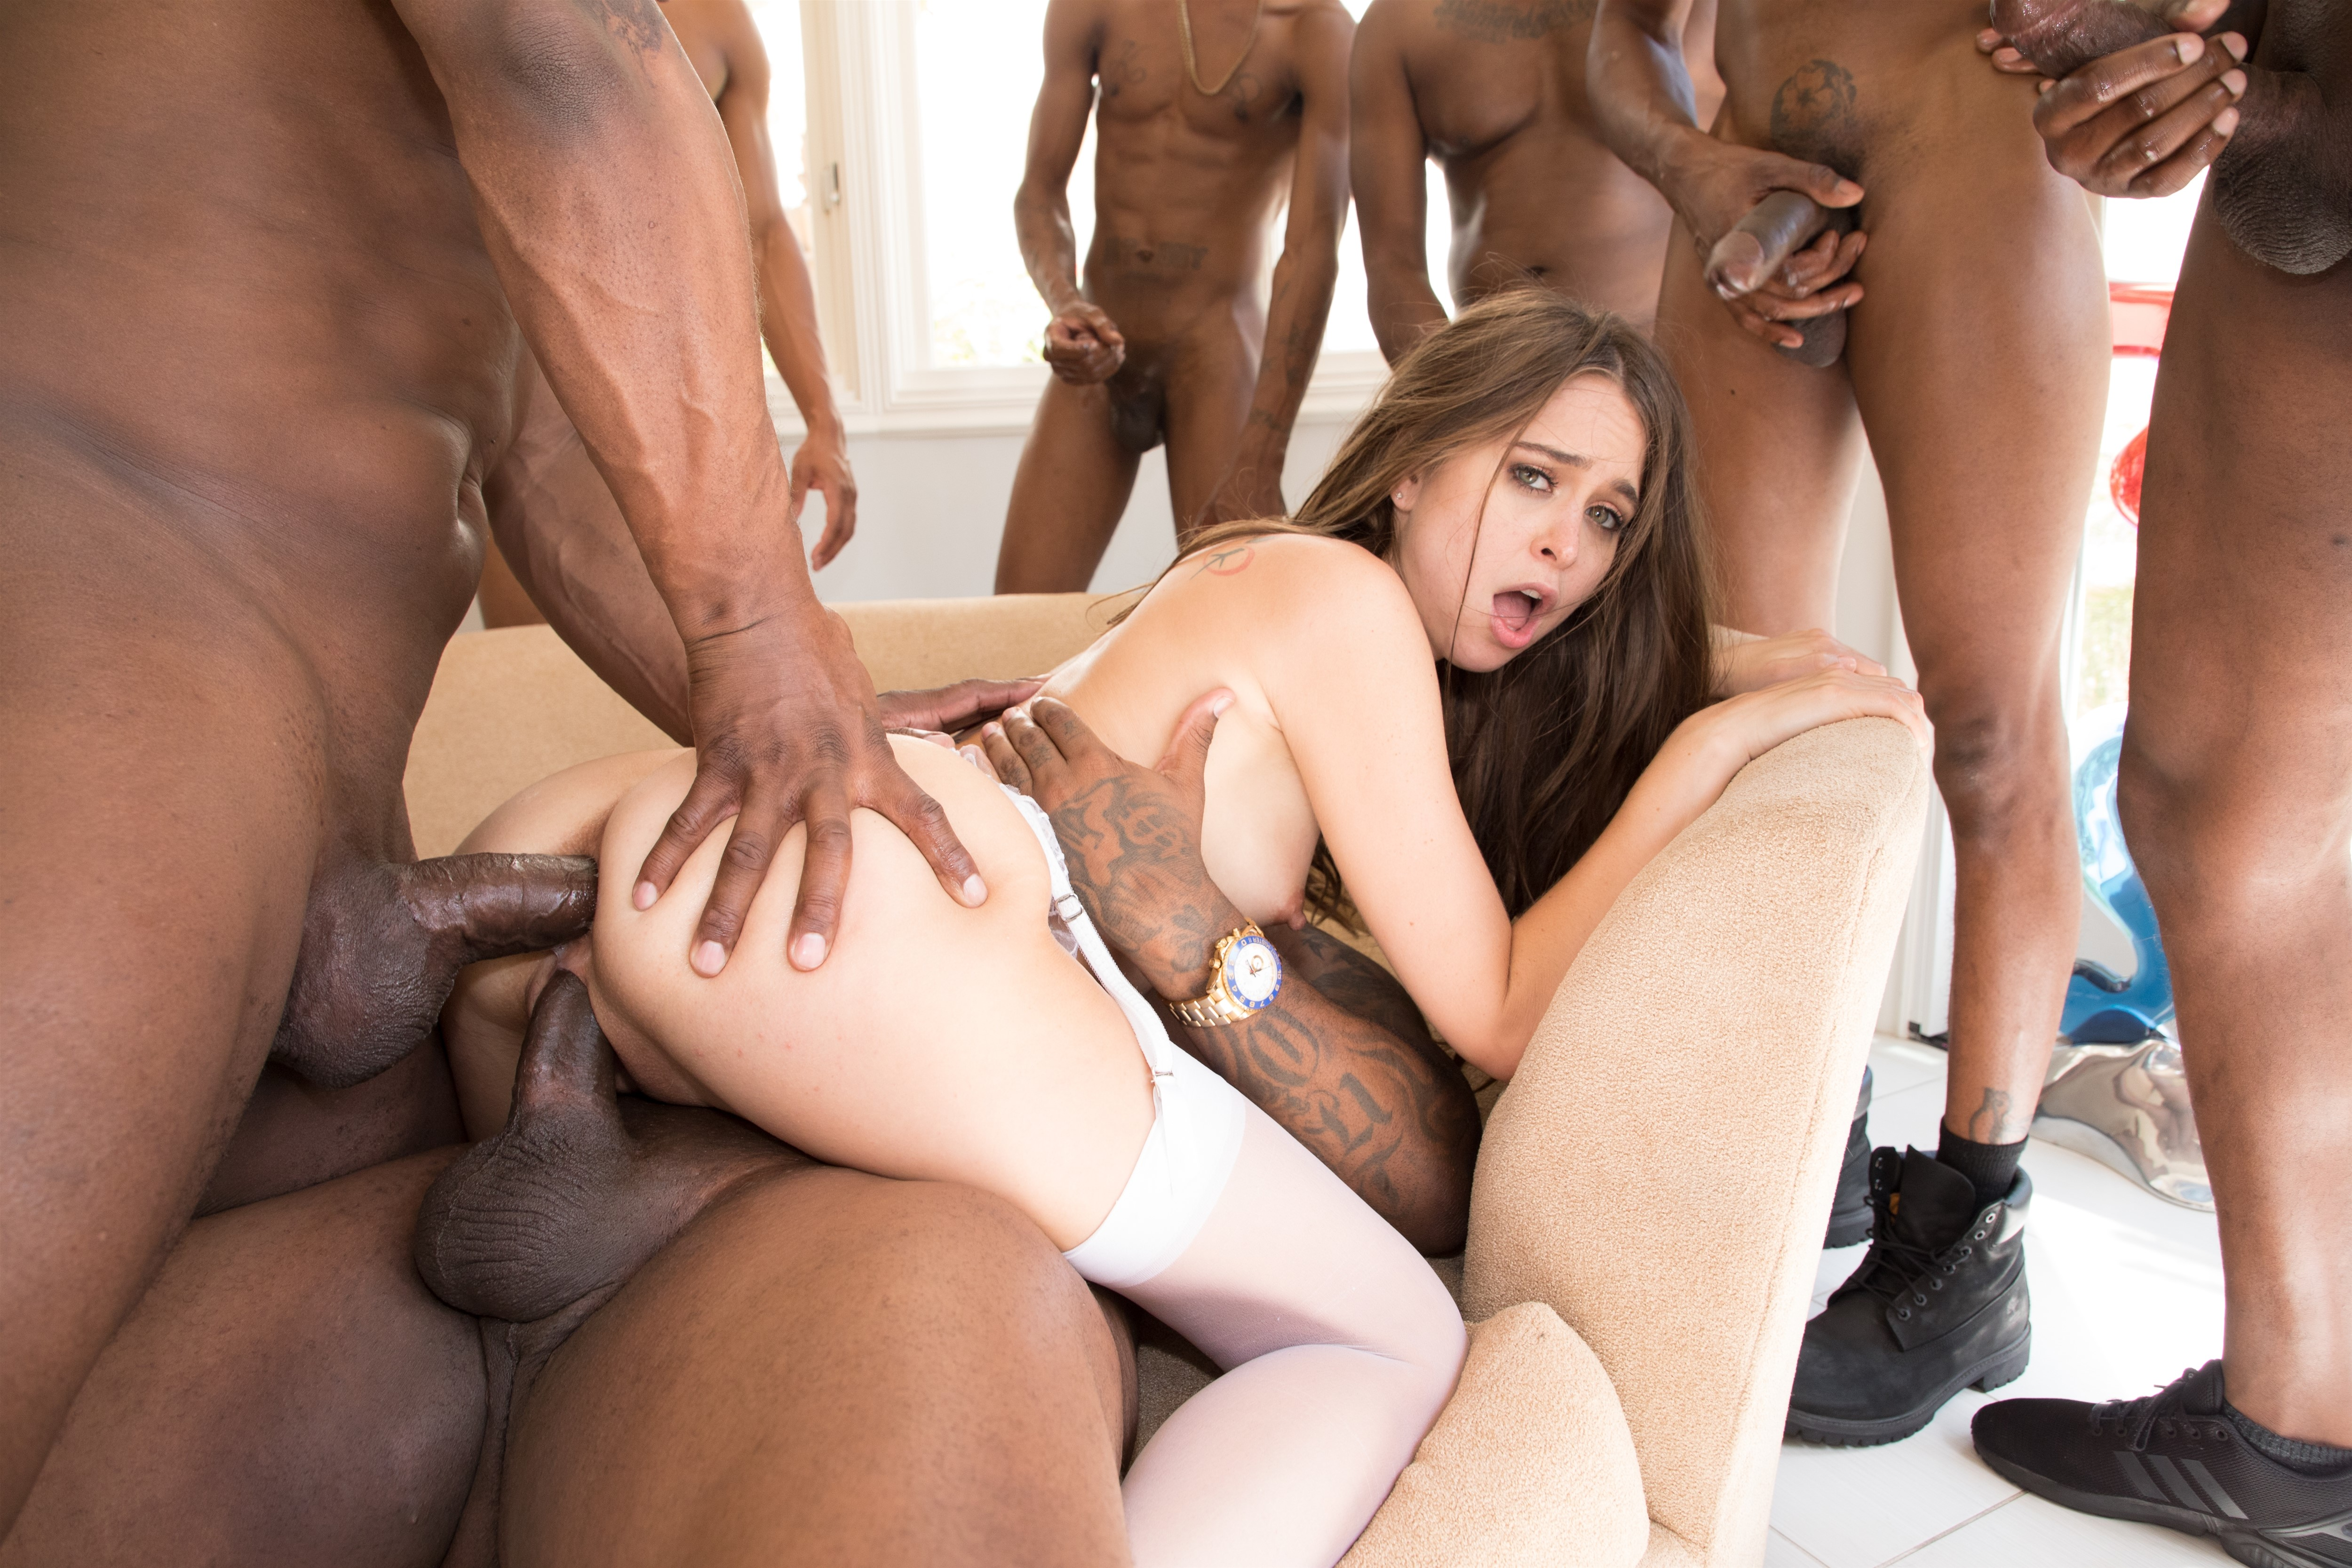 Nude girl interracial anal bang